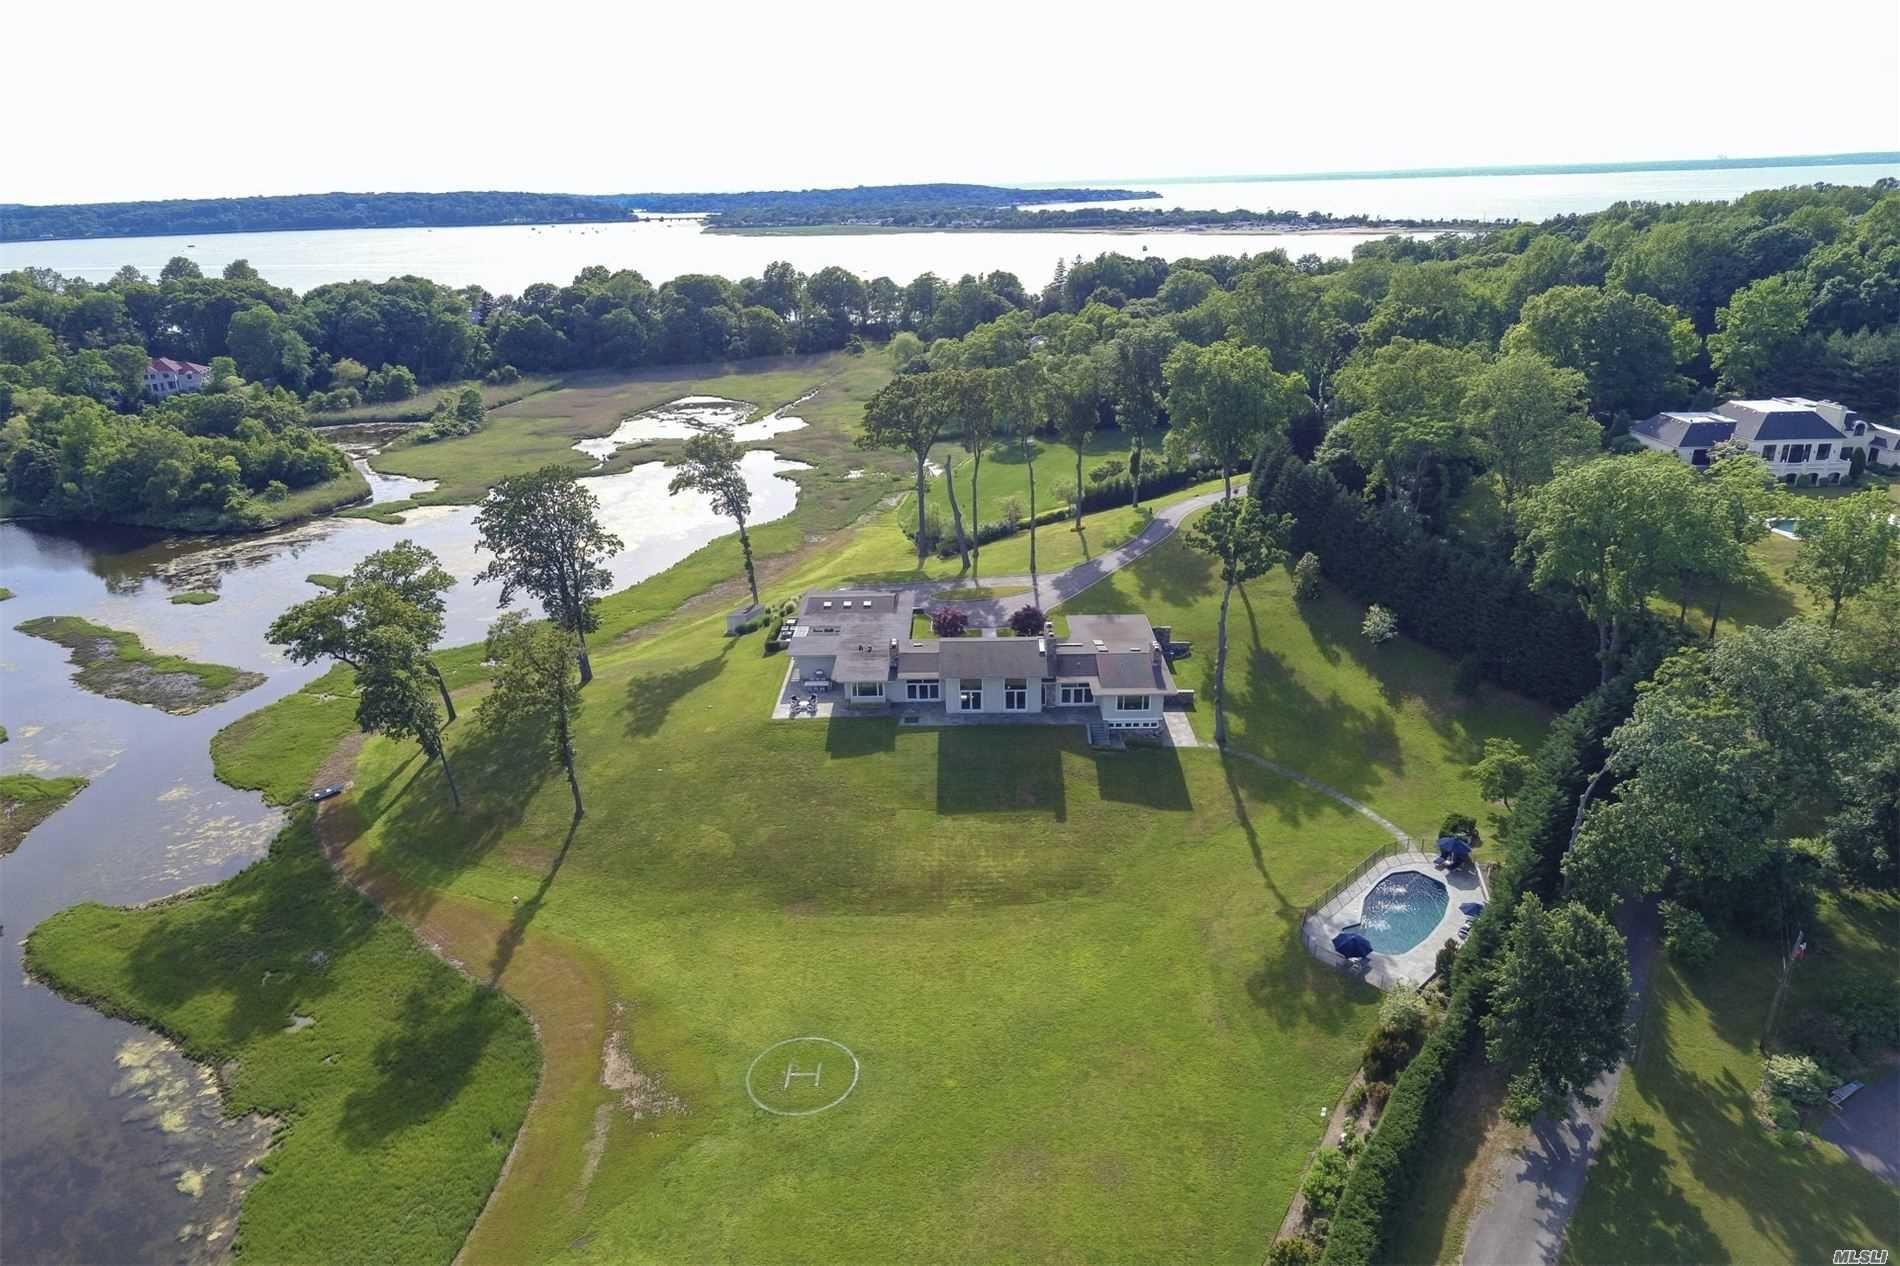 Photo of 111 Private Road, Centre Island, NY 11771 (MLS # 3224068)